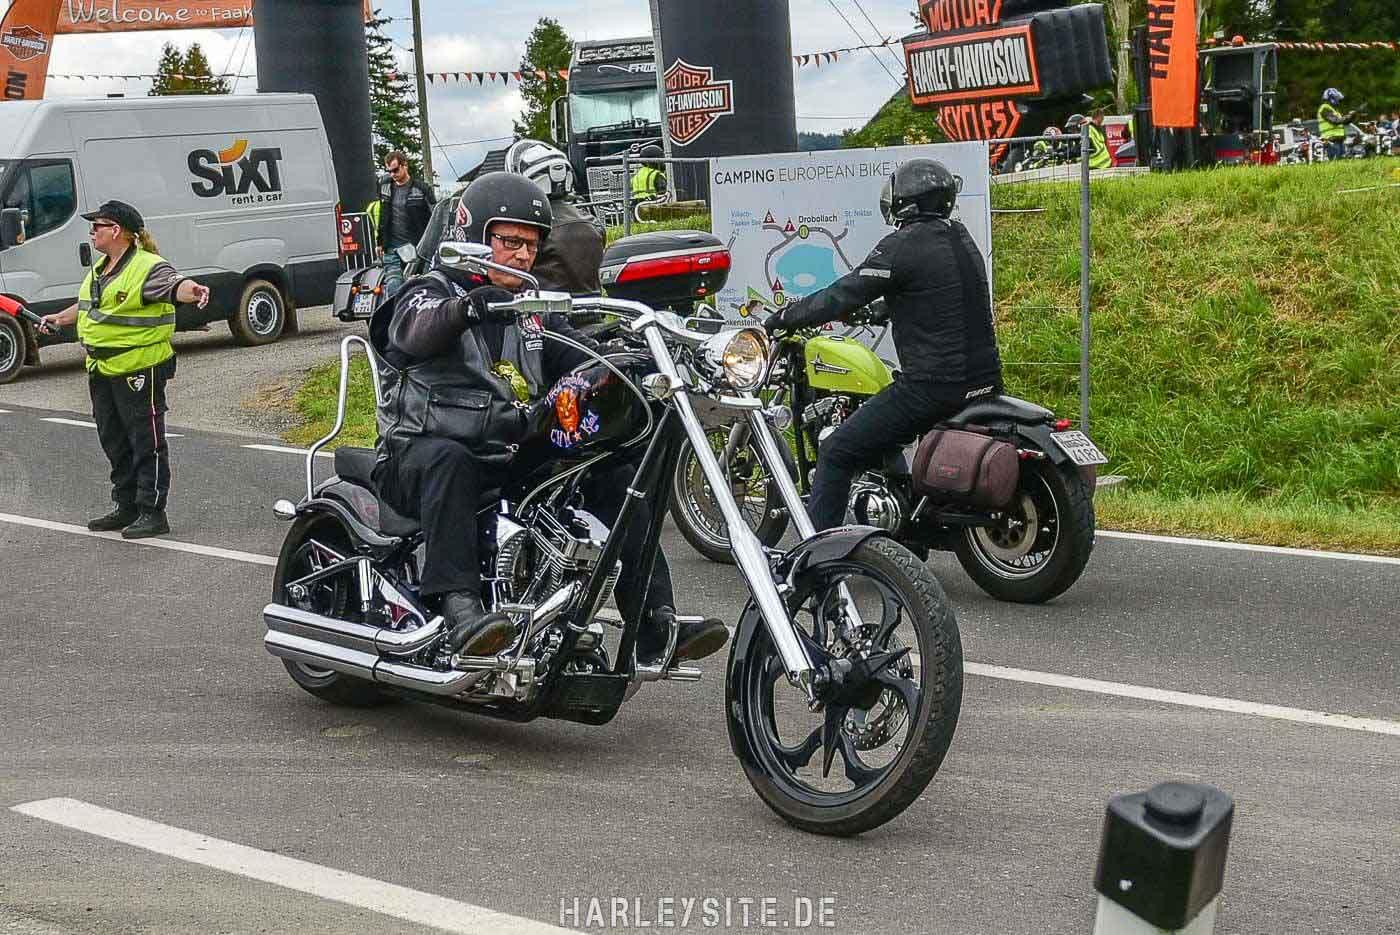 European Bike Week 2017